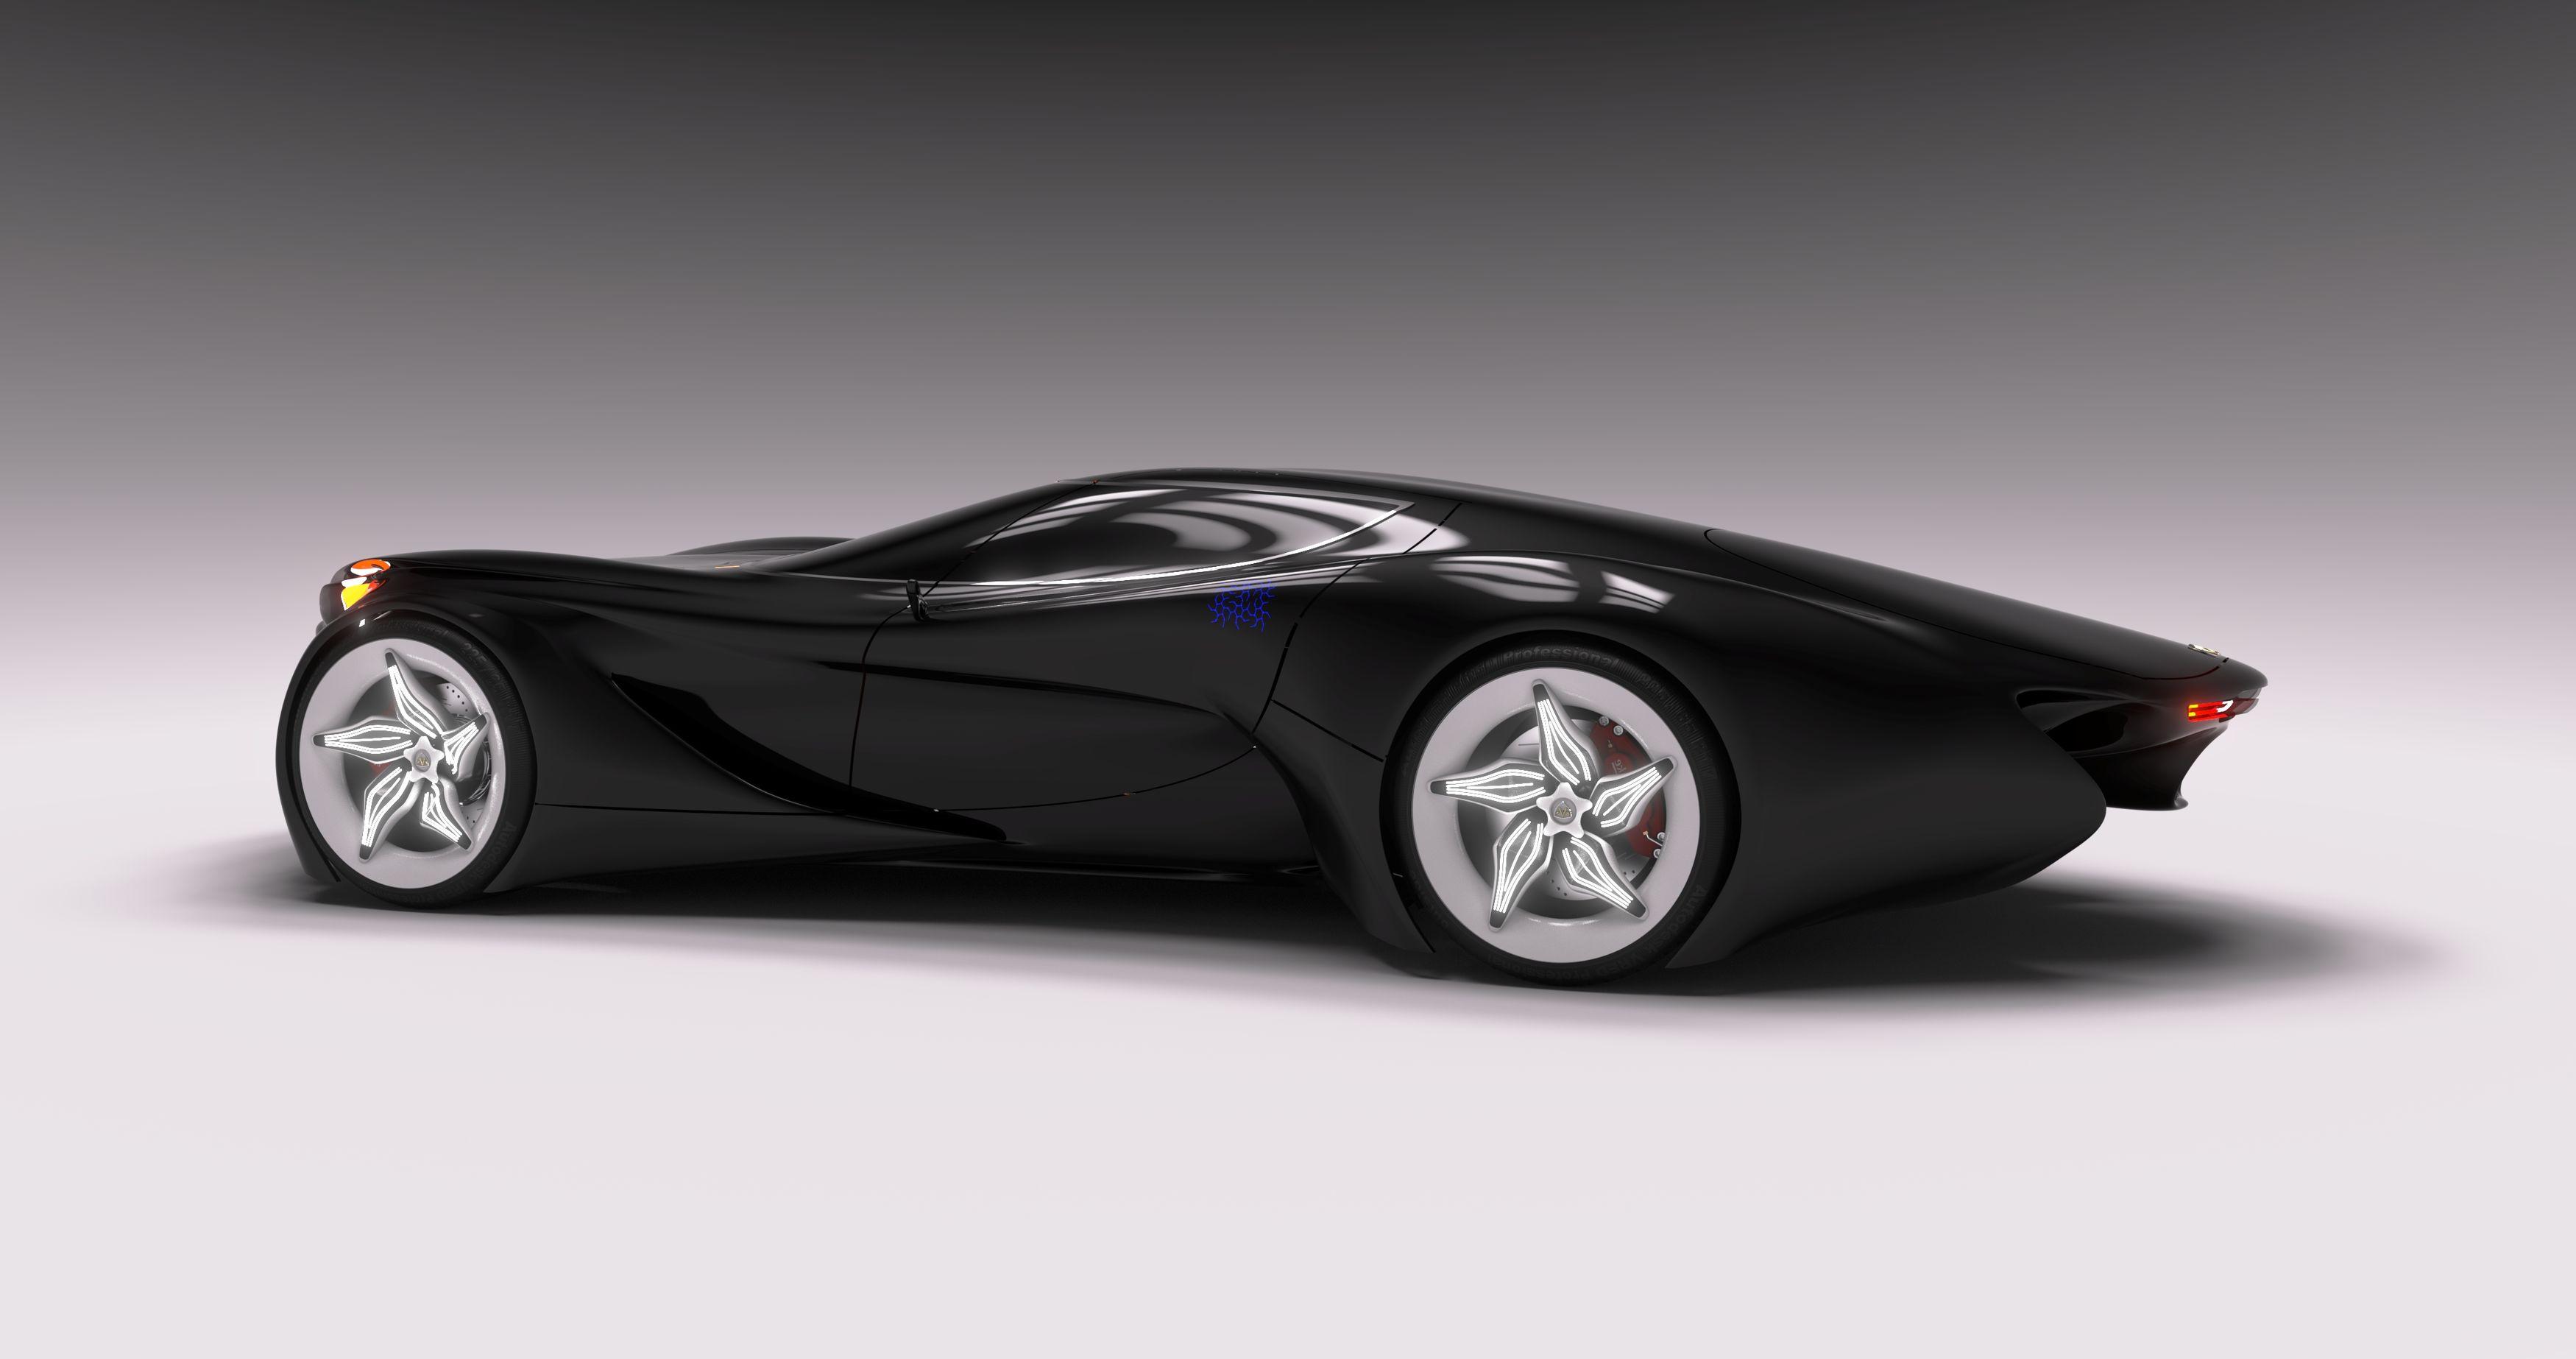 Mercedes-cls-phantom-3-3500-3500